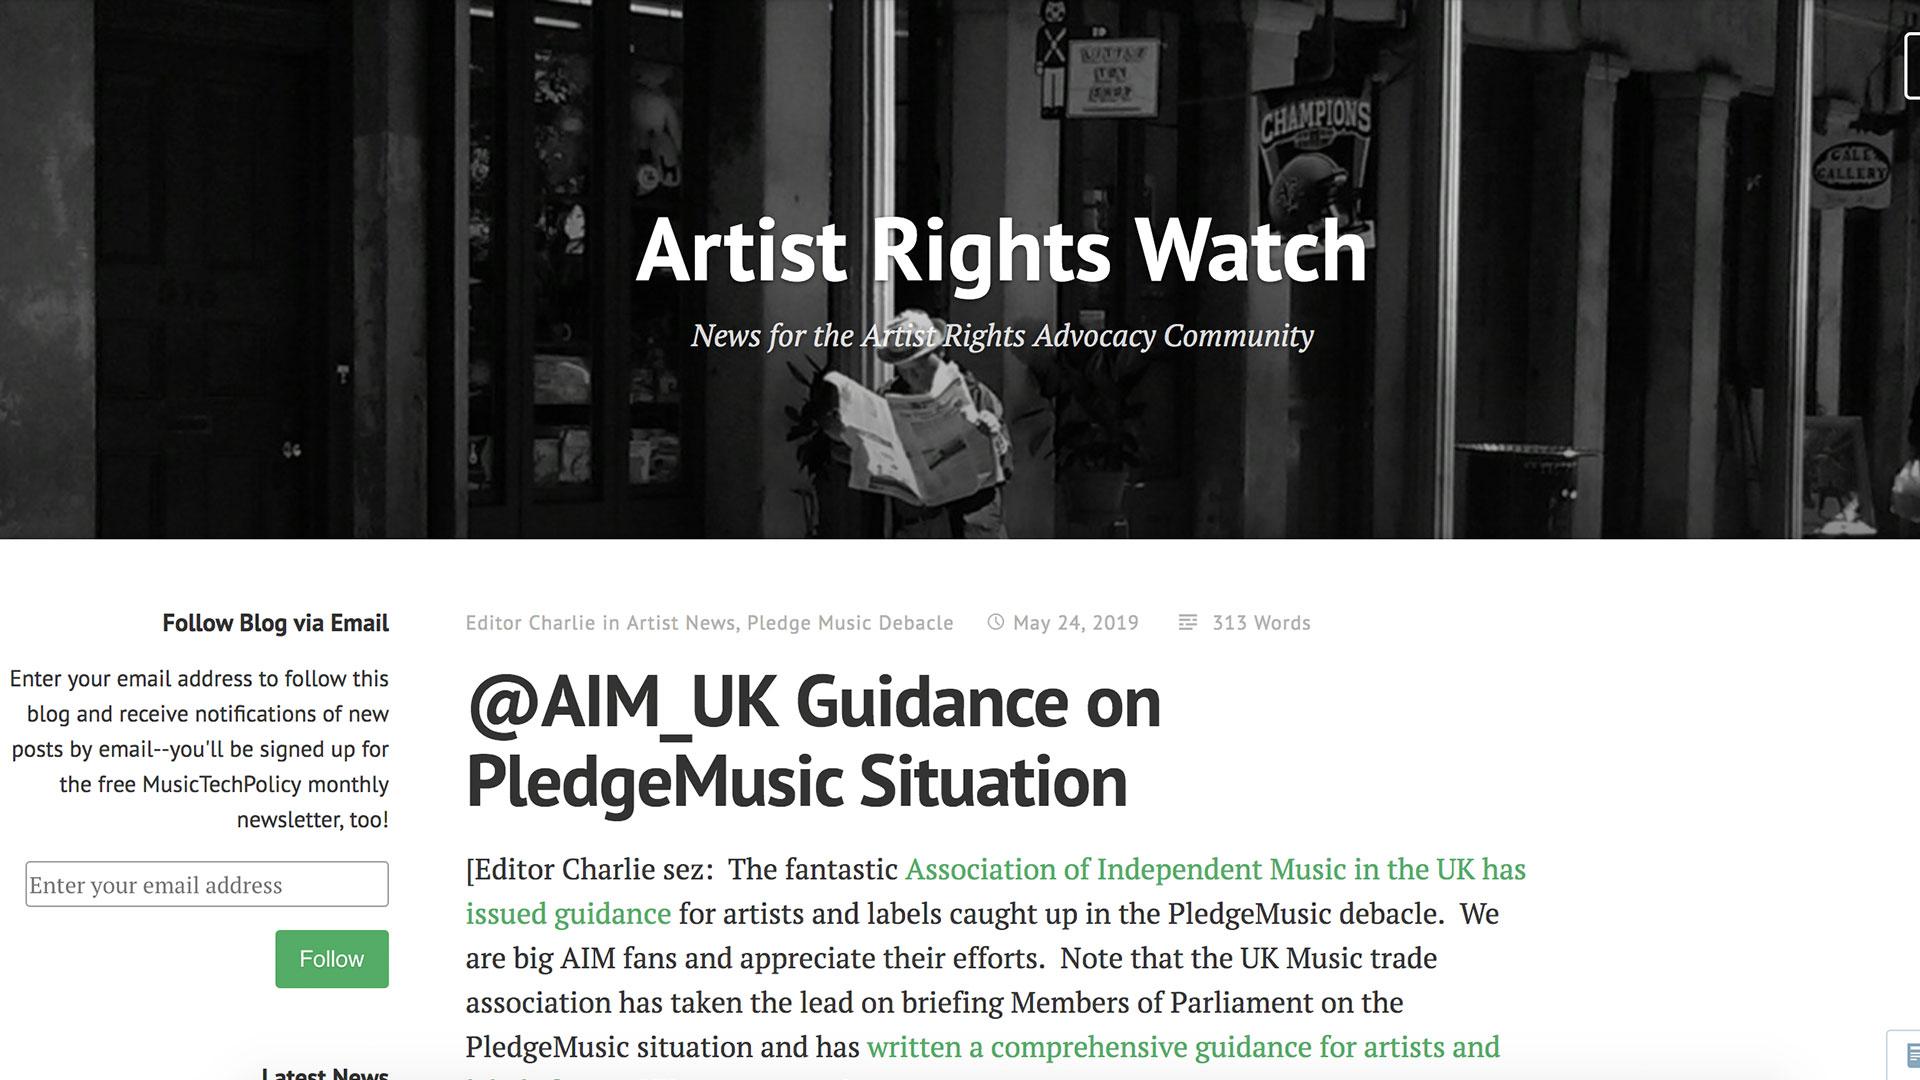 Fairness Rocks News @AIM_UK Guidance on PledgeMusic Situation